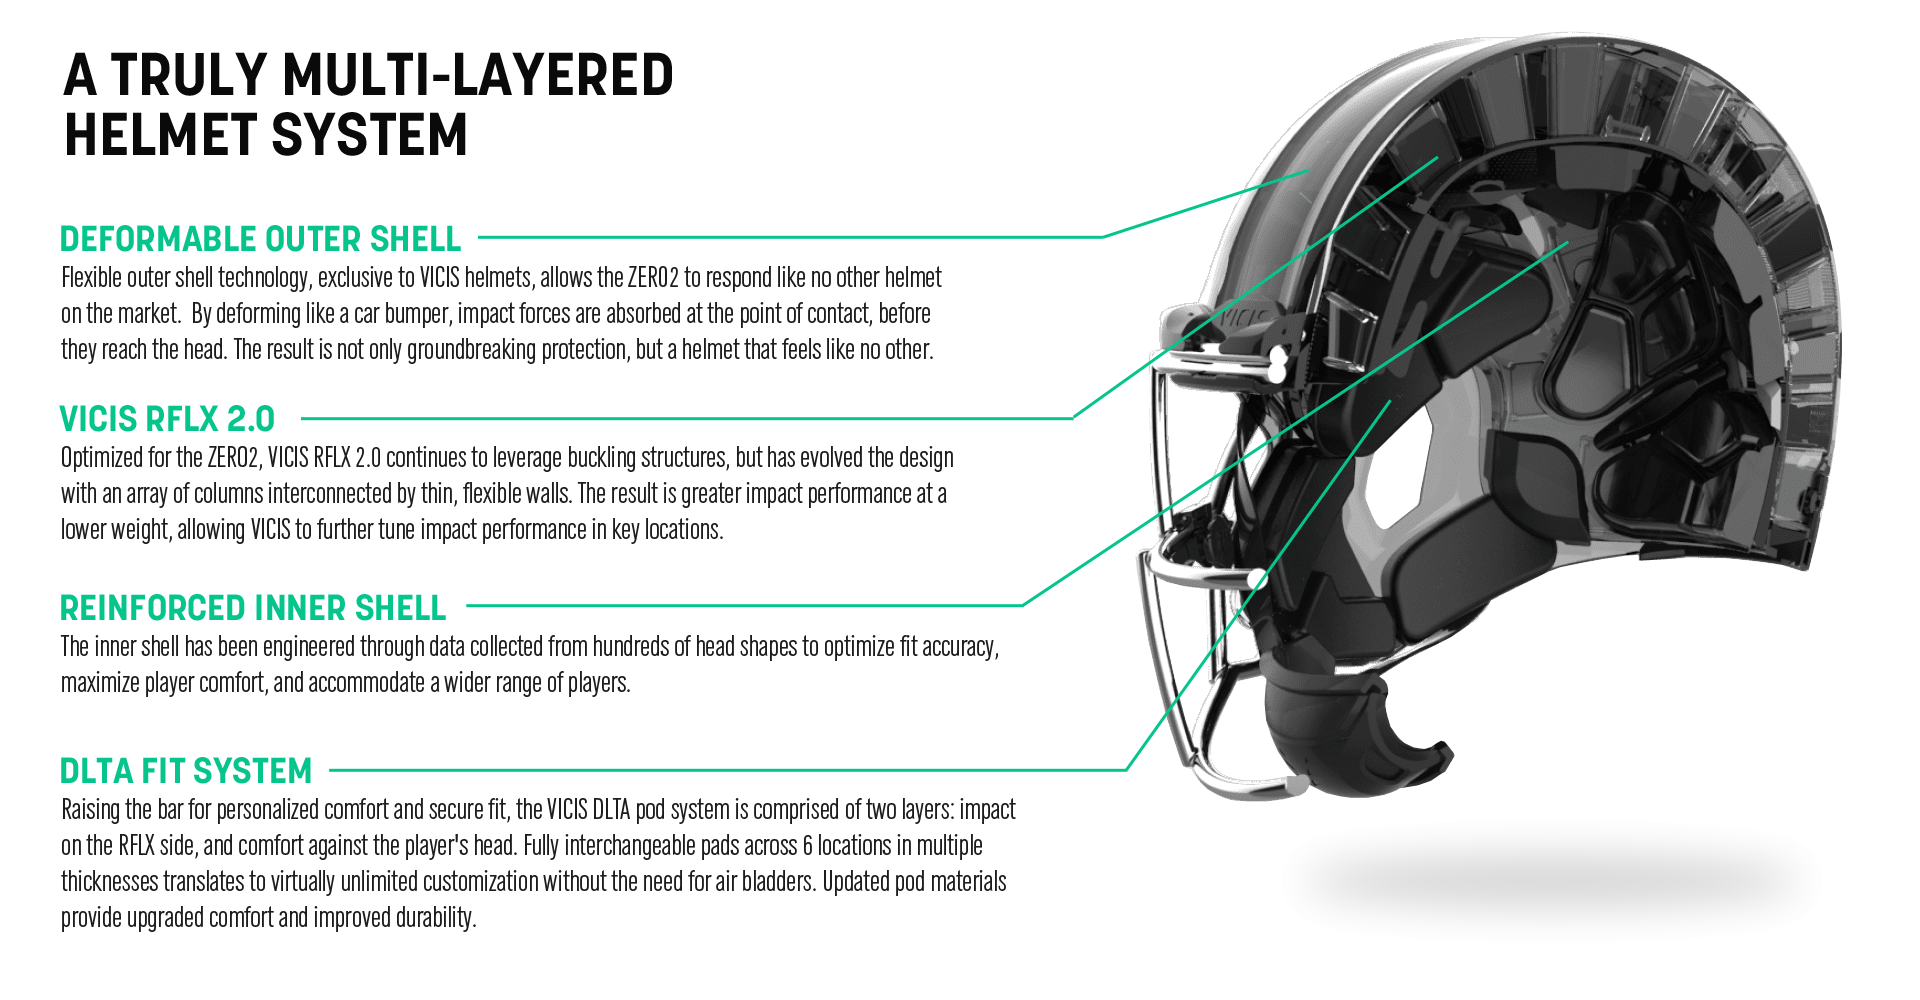 Multi-Layered Helmet System